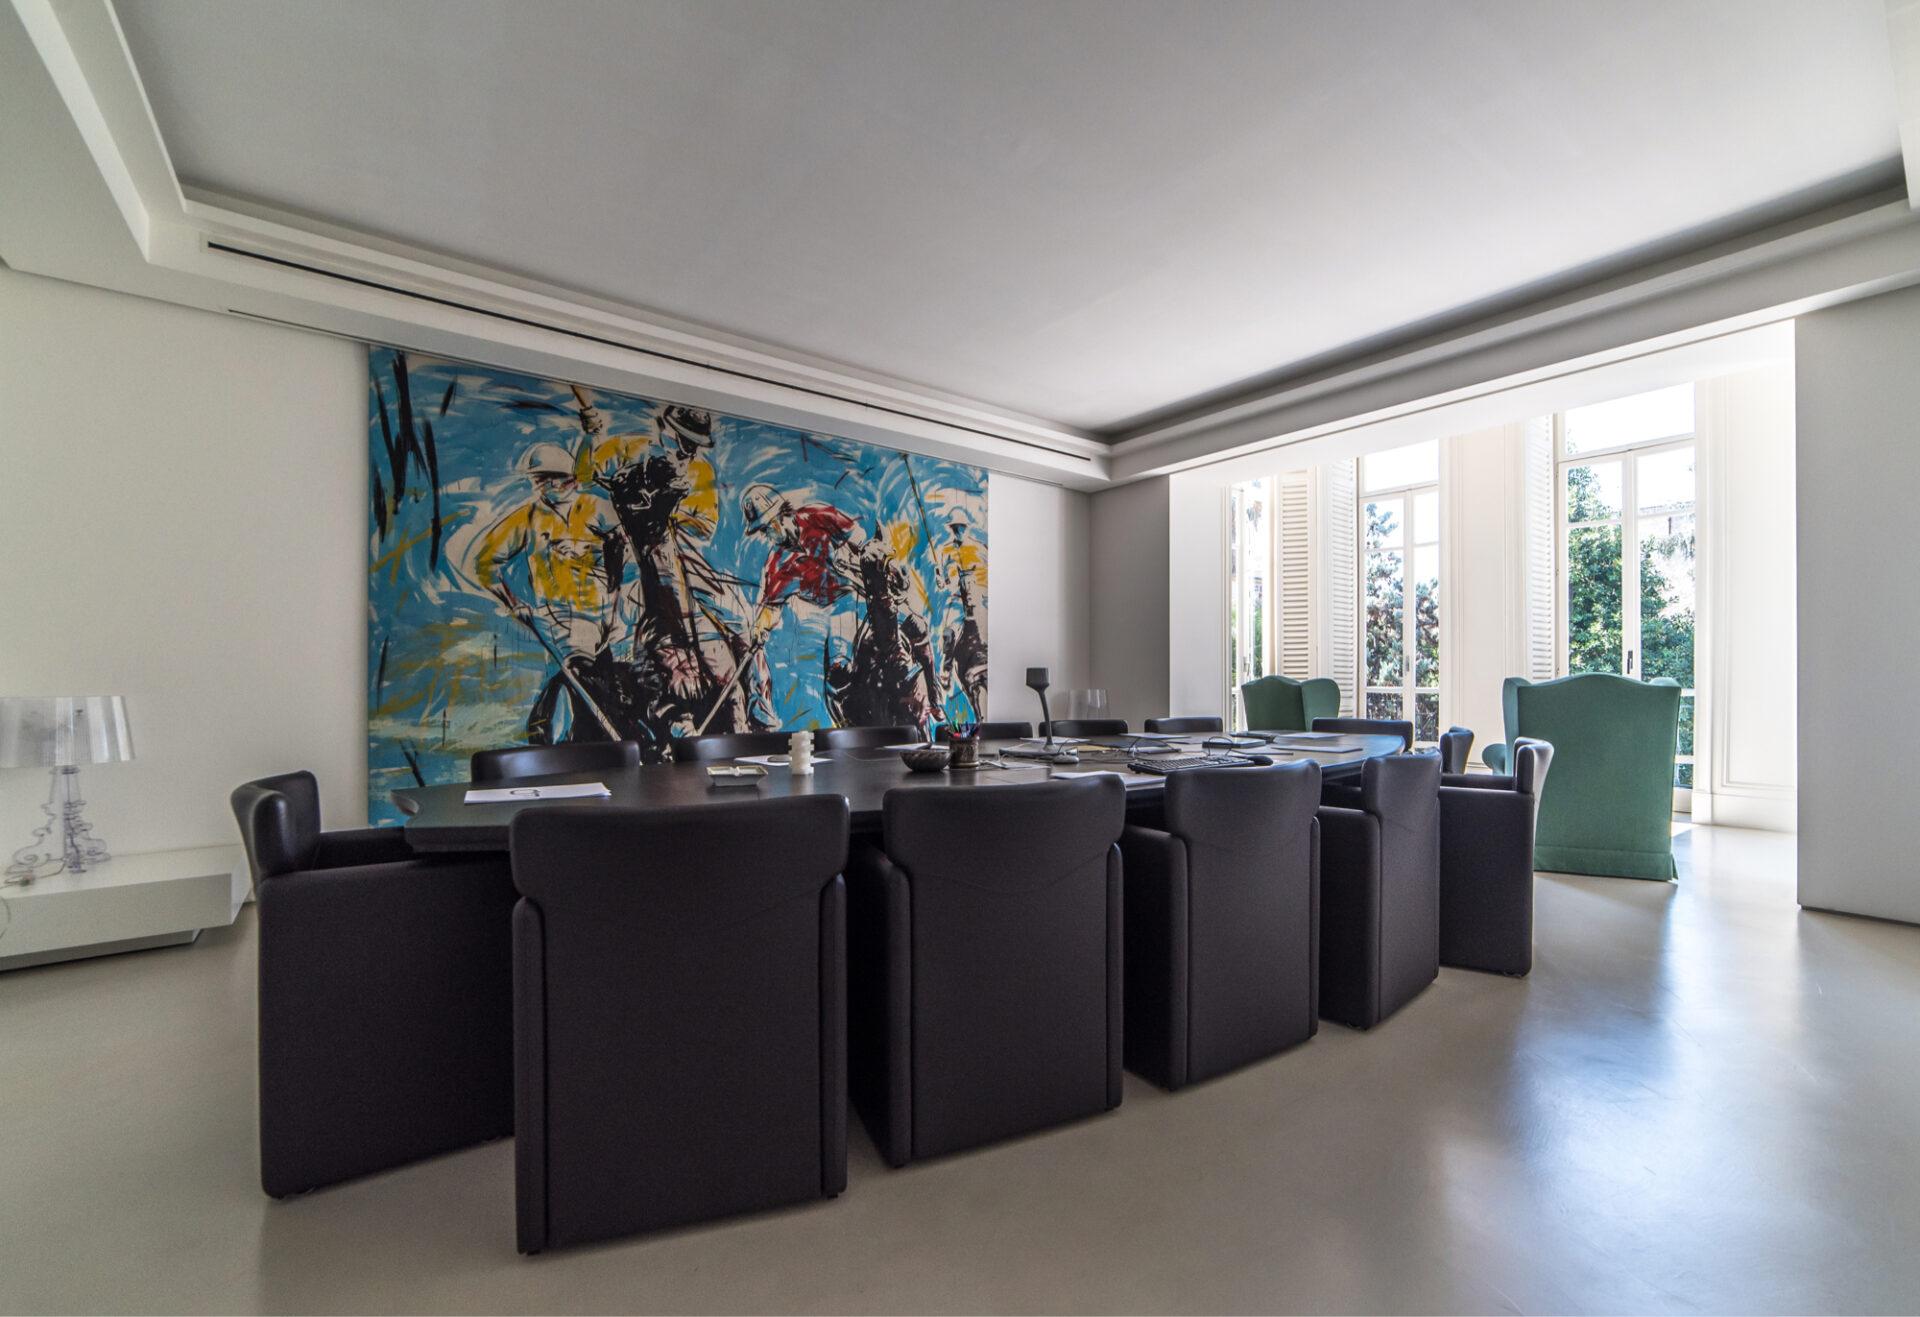 Pontano 44 Napoli - Sala riunioni - Immobili Cittamoderna